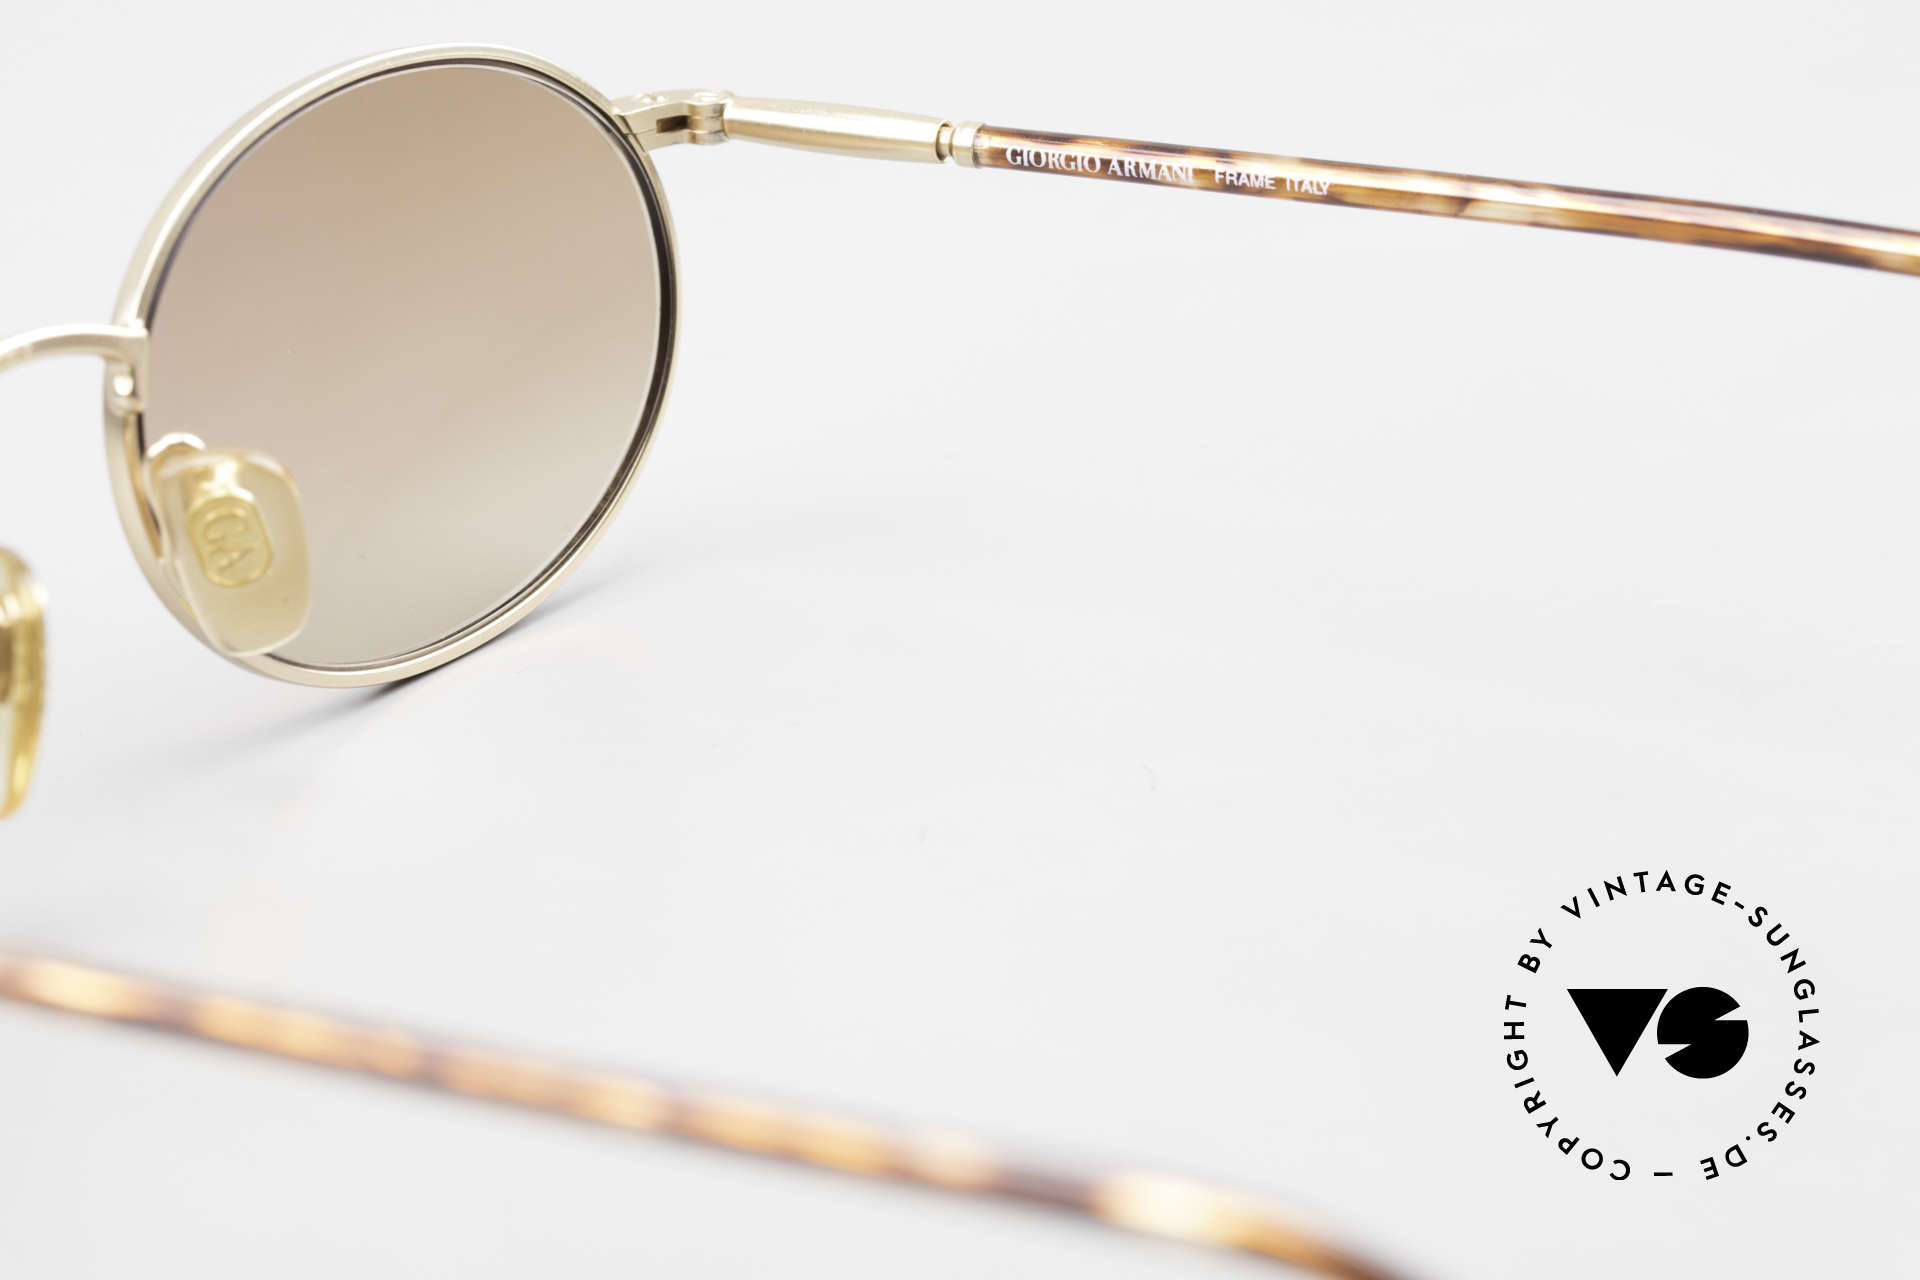 Giorgio Armani 192 80's Sunglasses Oval Vintage, Size: medium, Made for Men and Women